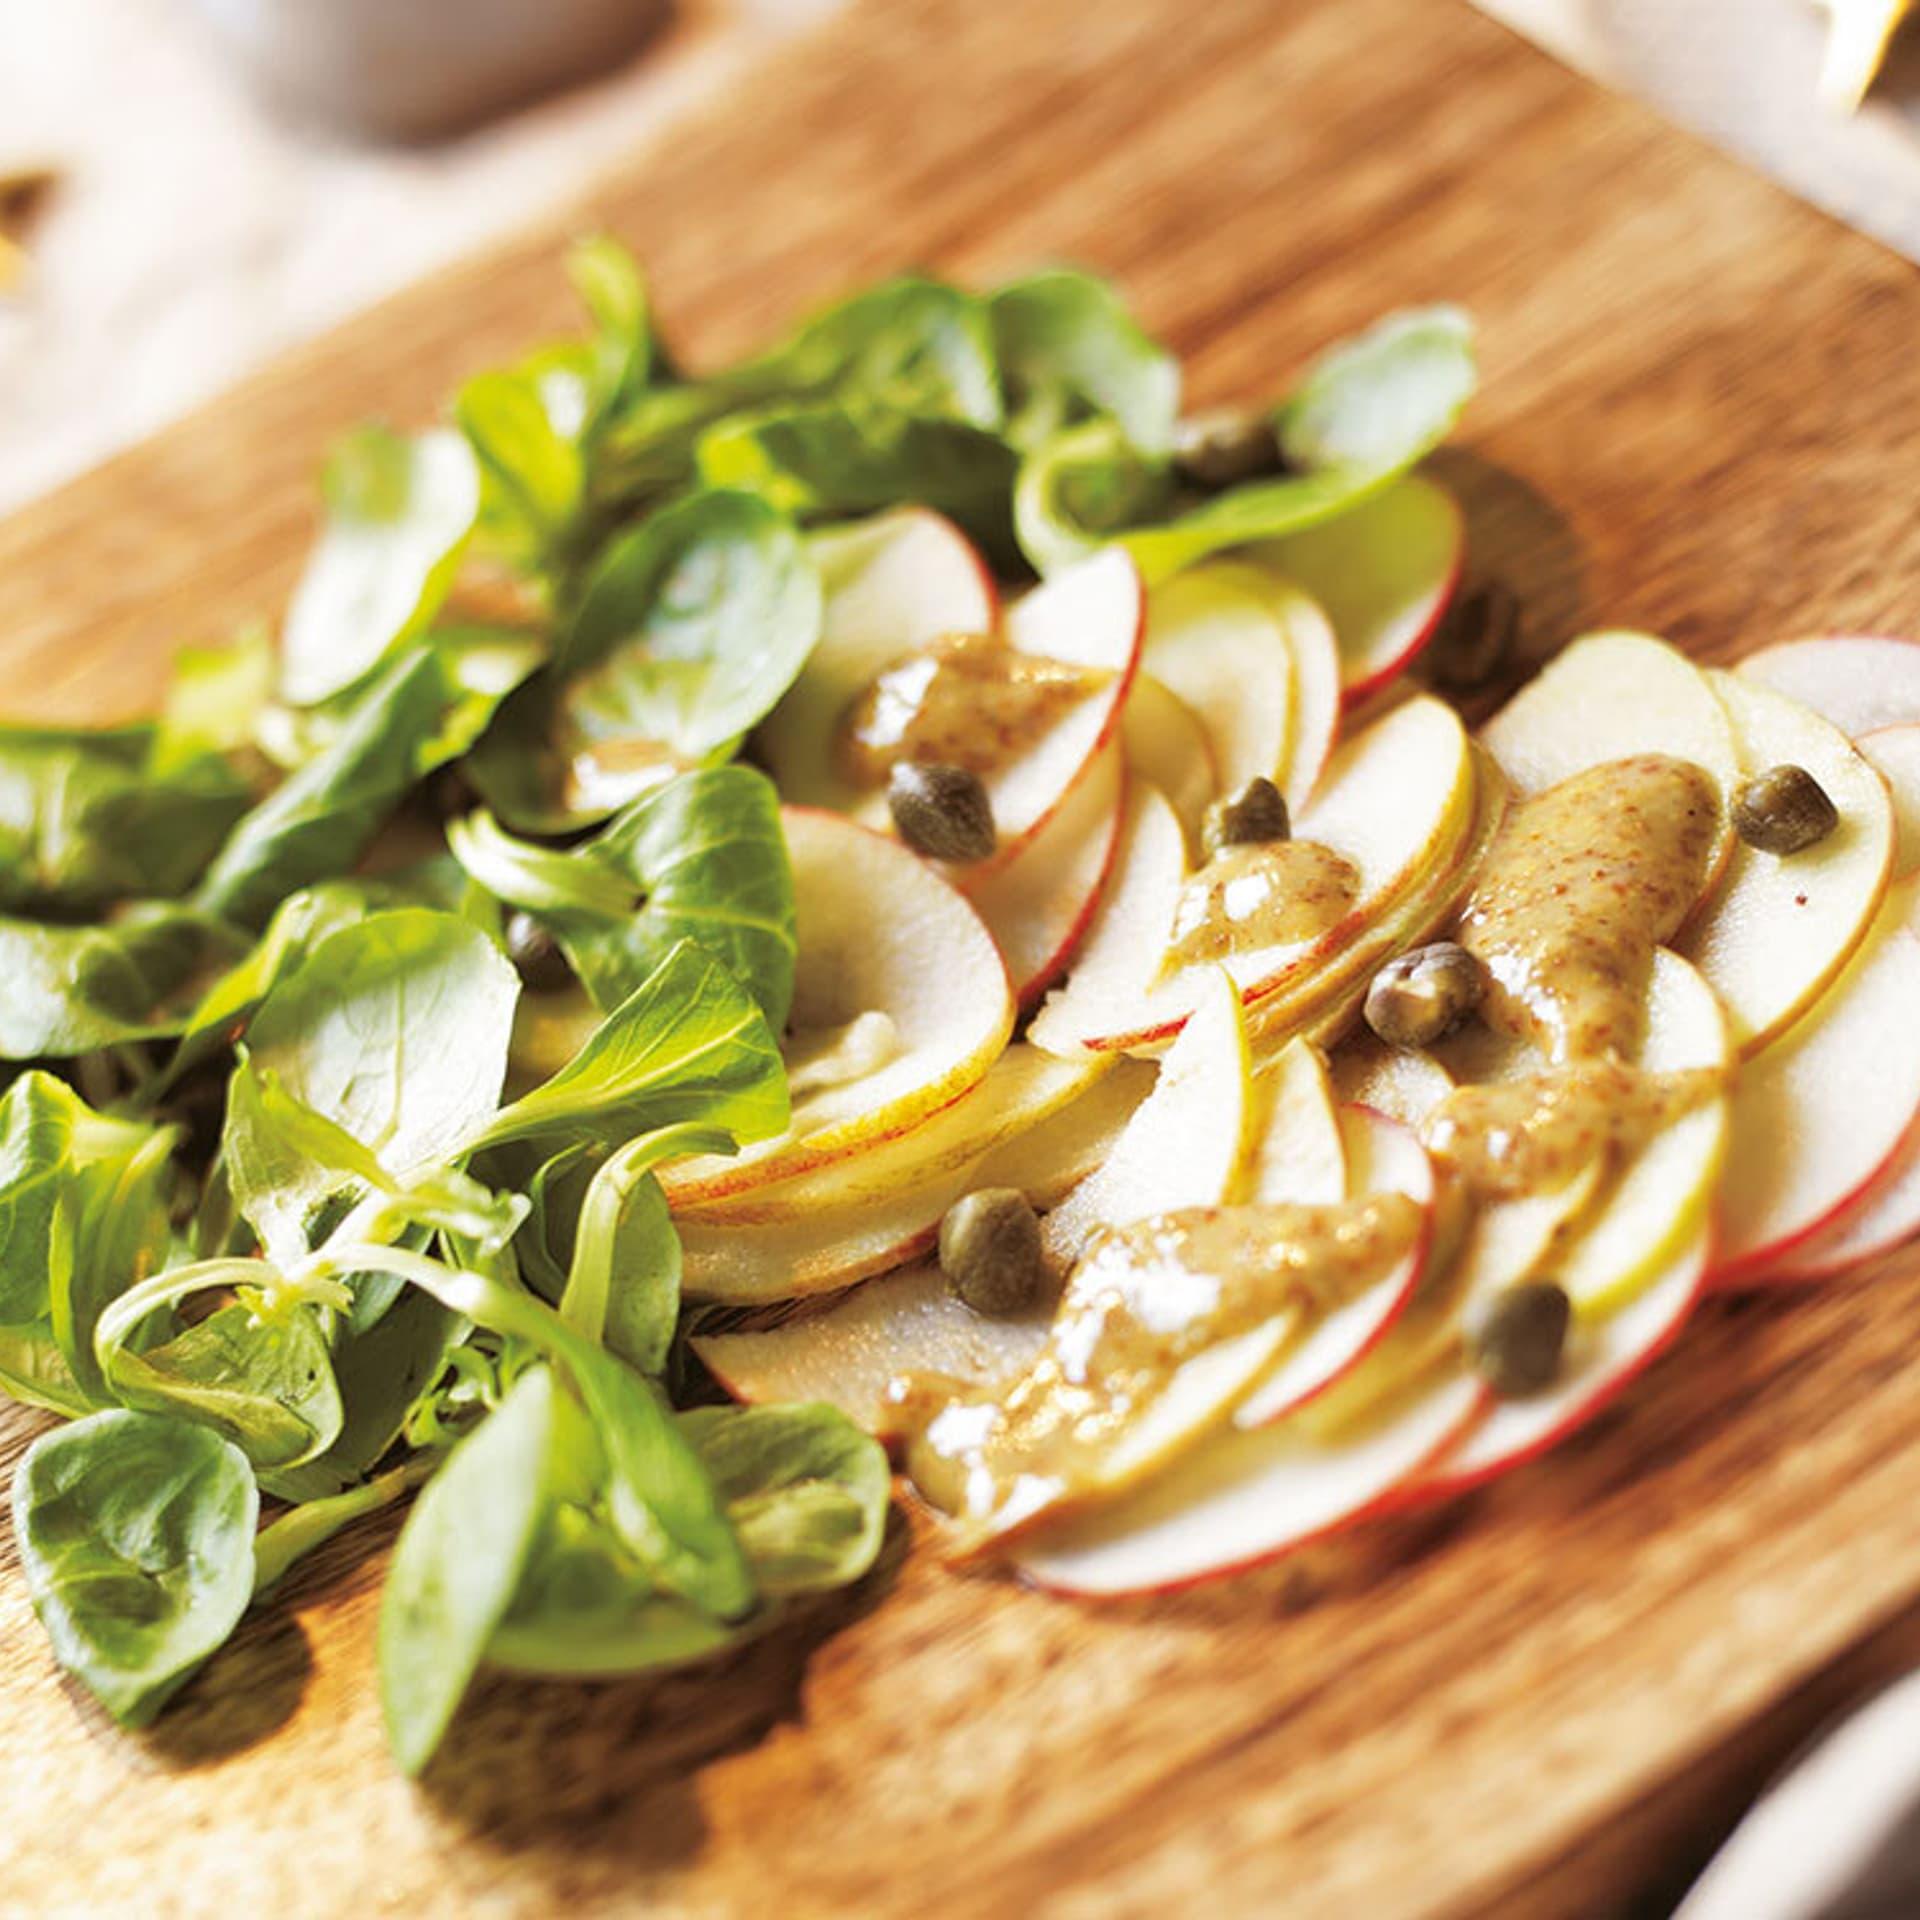 Apfel-Carpaccio mit Senf-Kapern-Dressing dazu Feldsalat